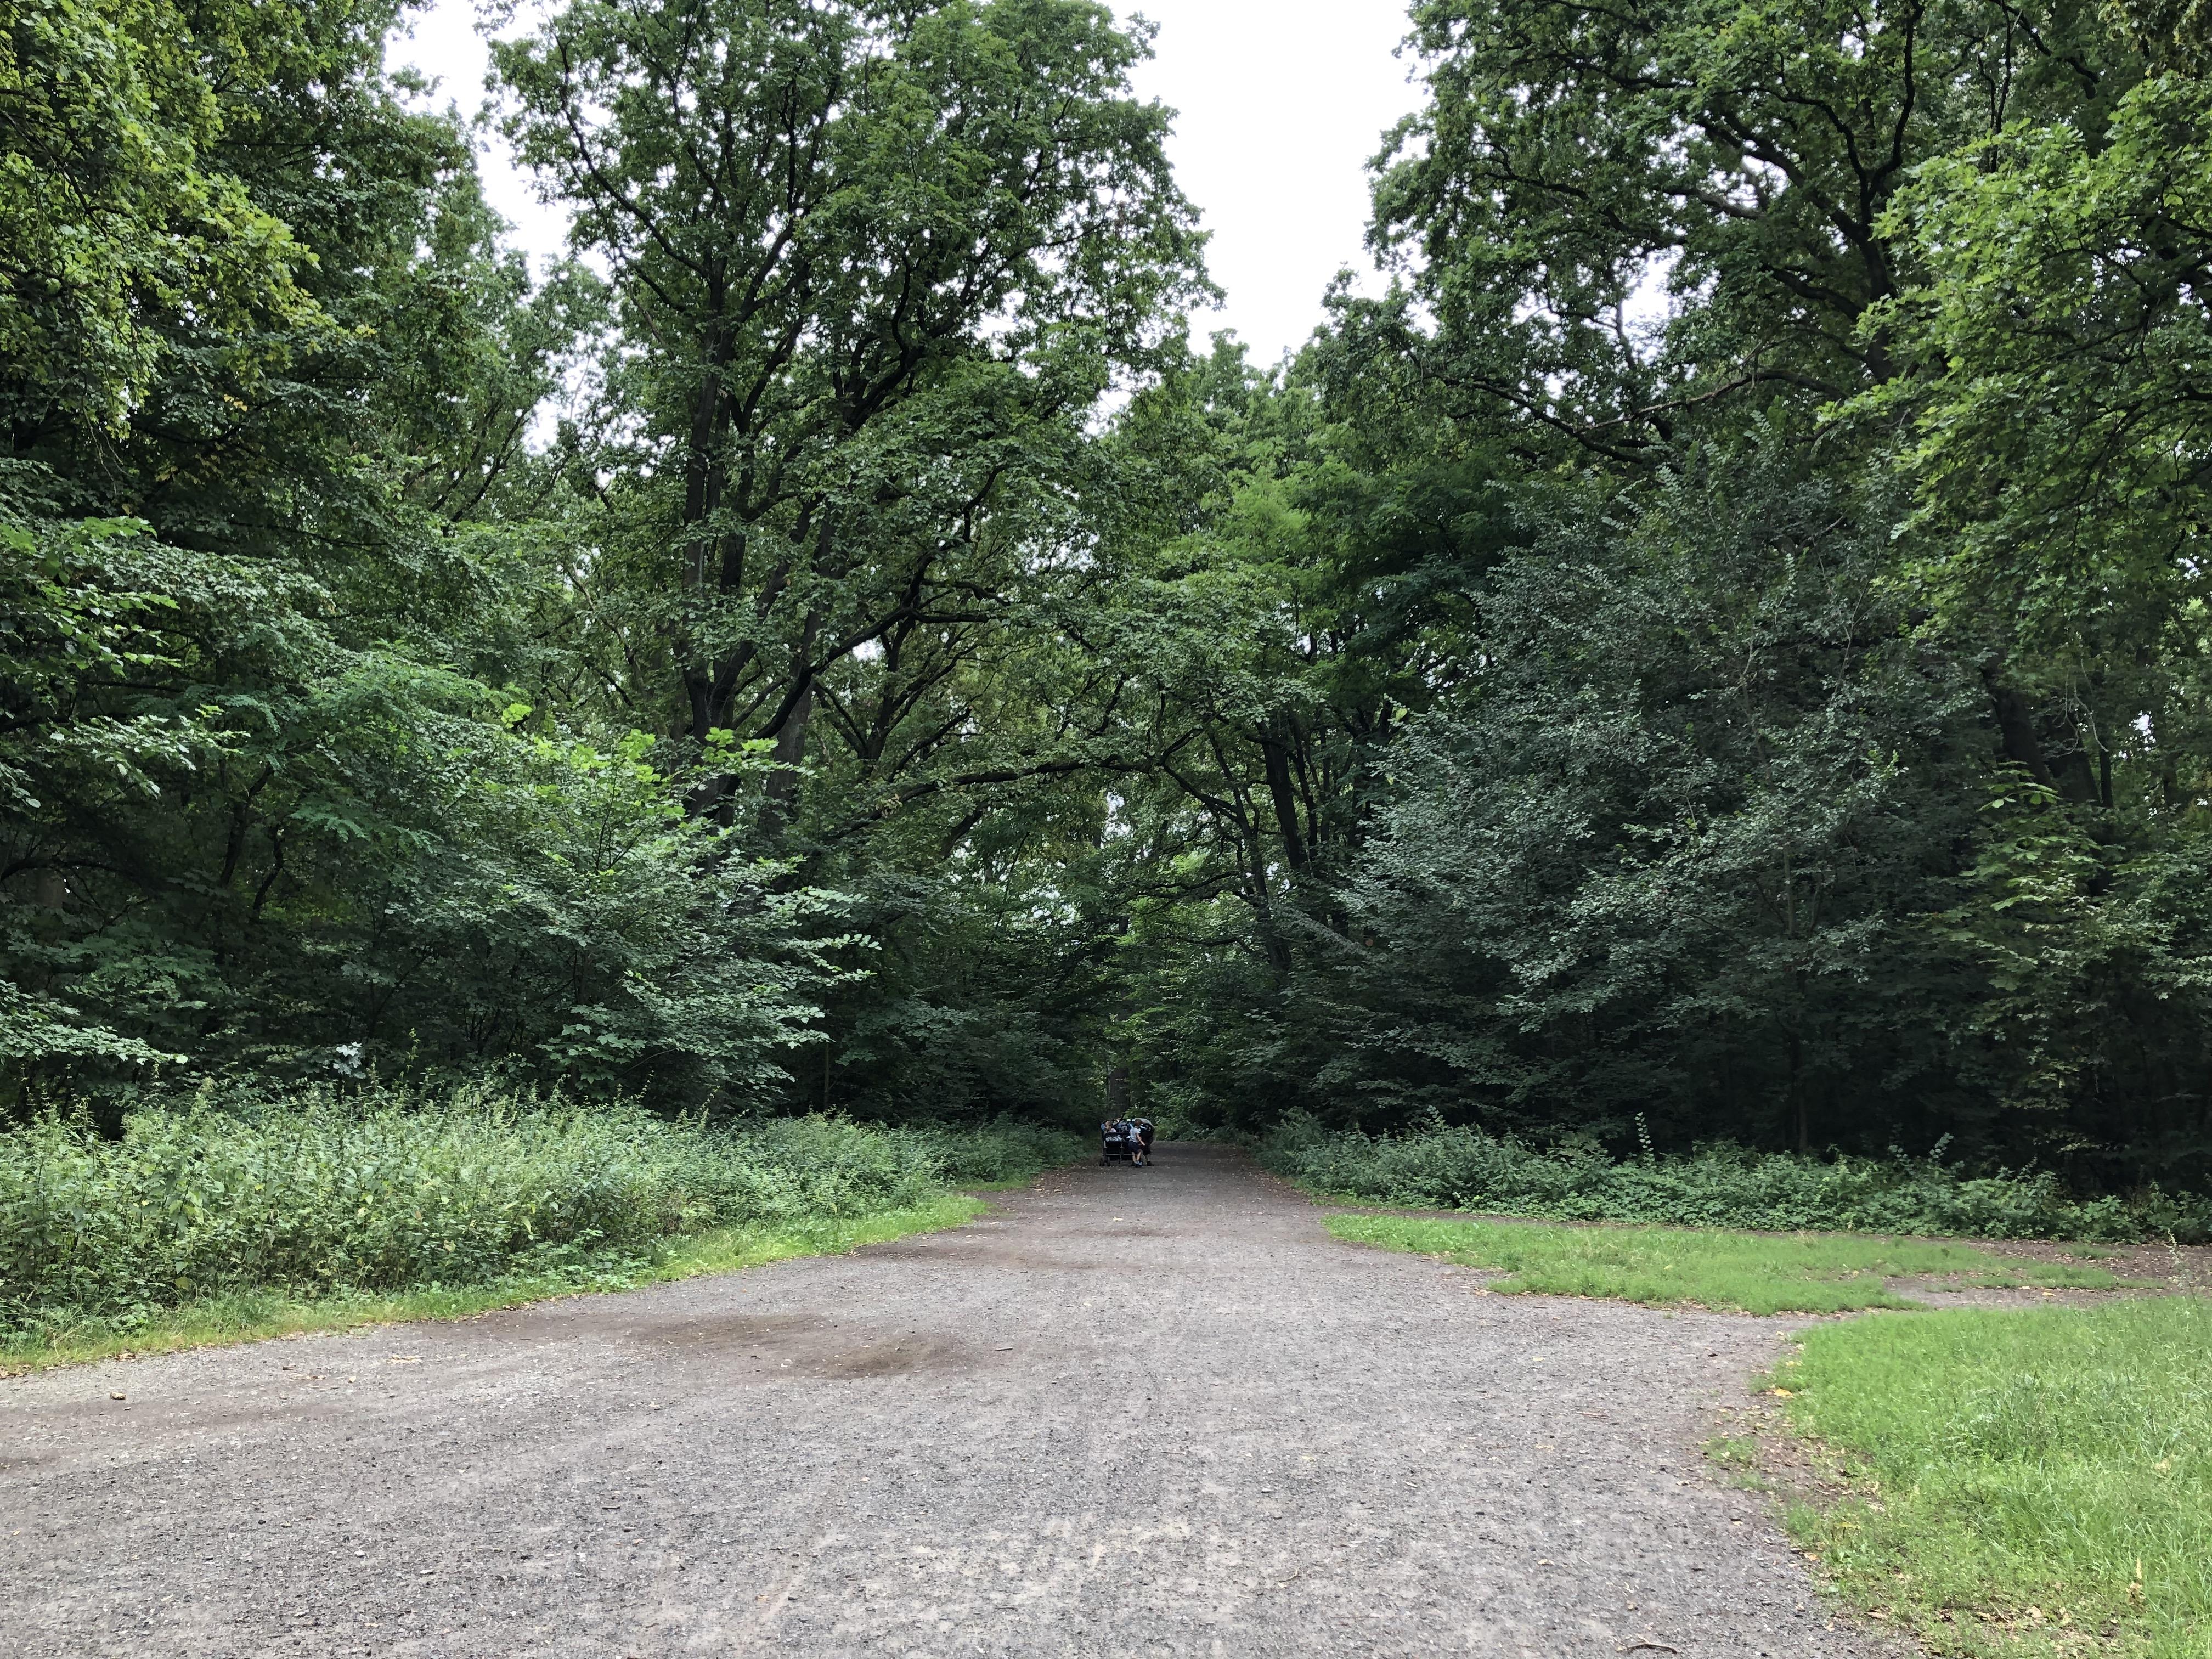 Plänterwald, Berlin